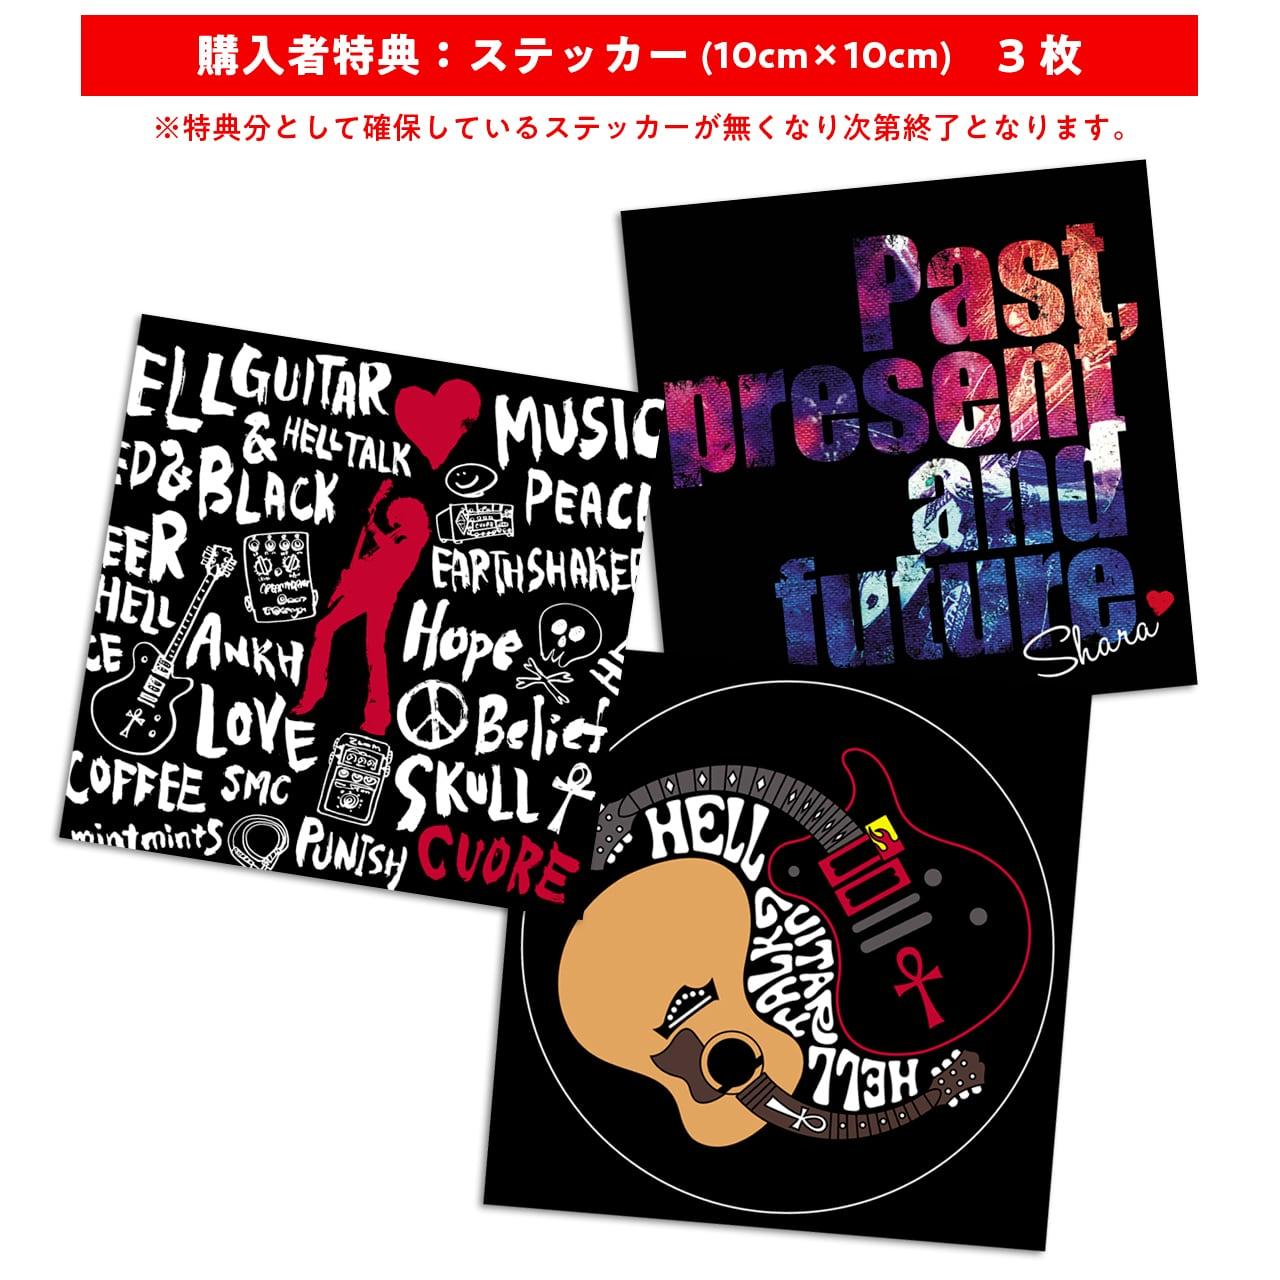 CD+DVD:『Love & mints』mintmints(ミントミンツ) +特典付 - 画像2